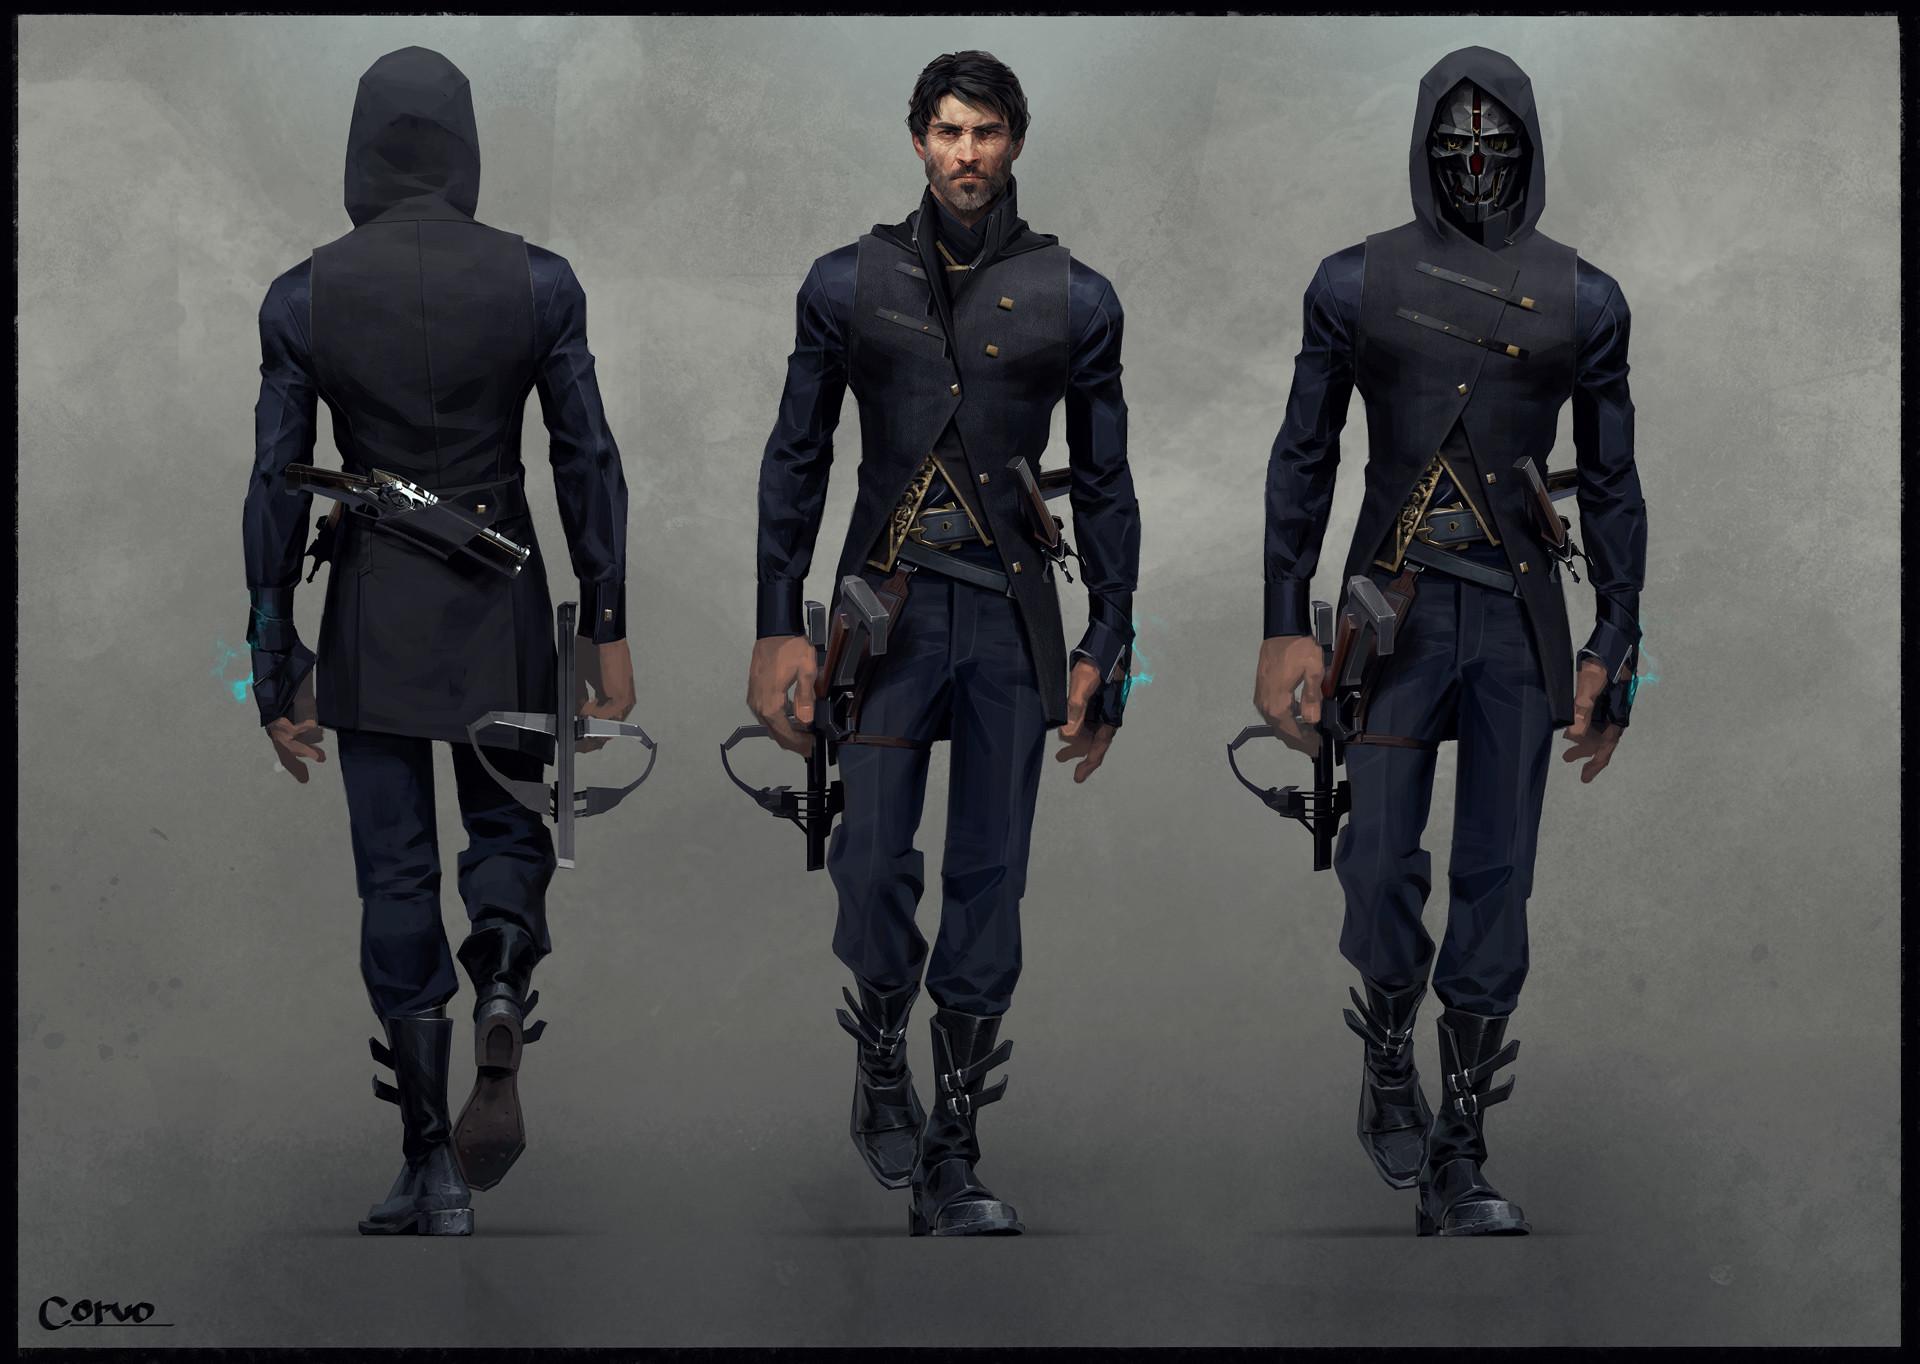 sergey-kolesov-corvo-outfit.jpg